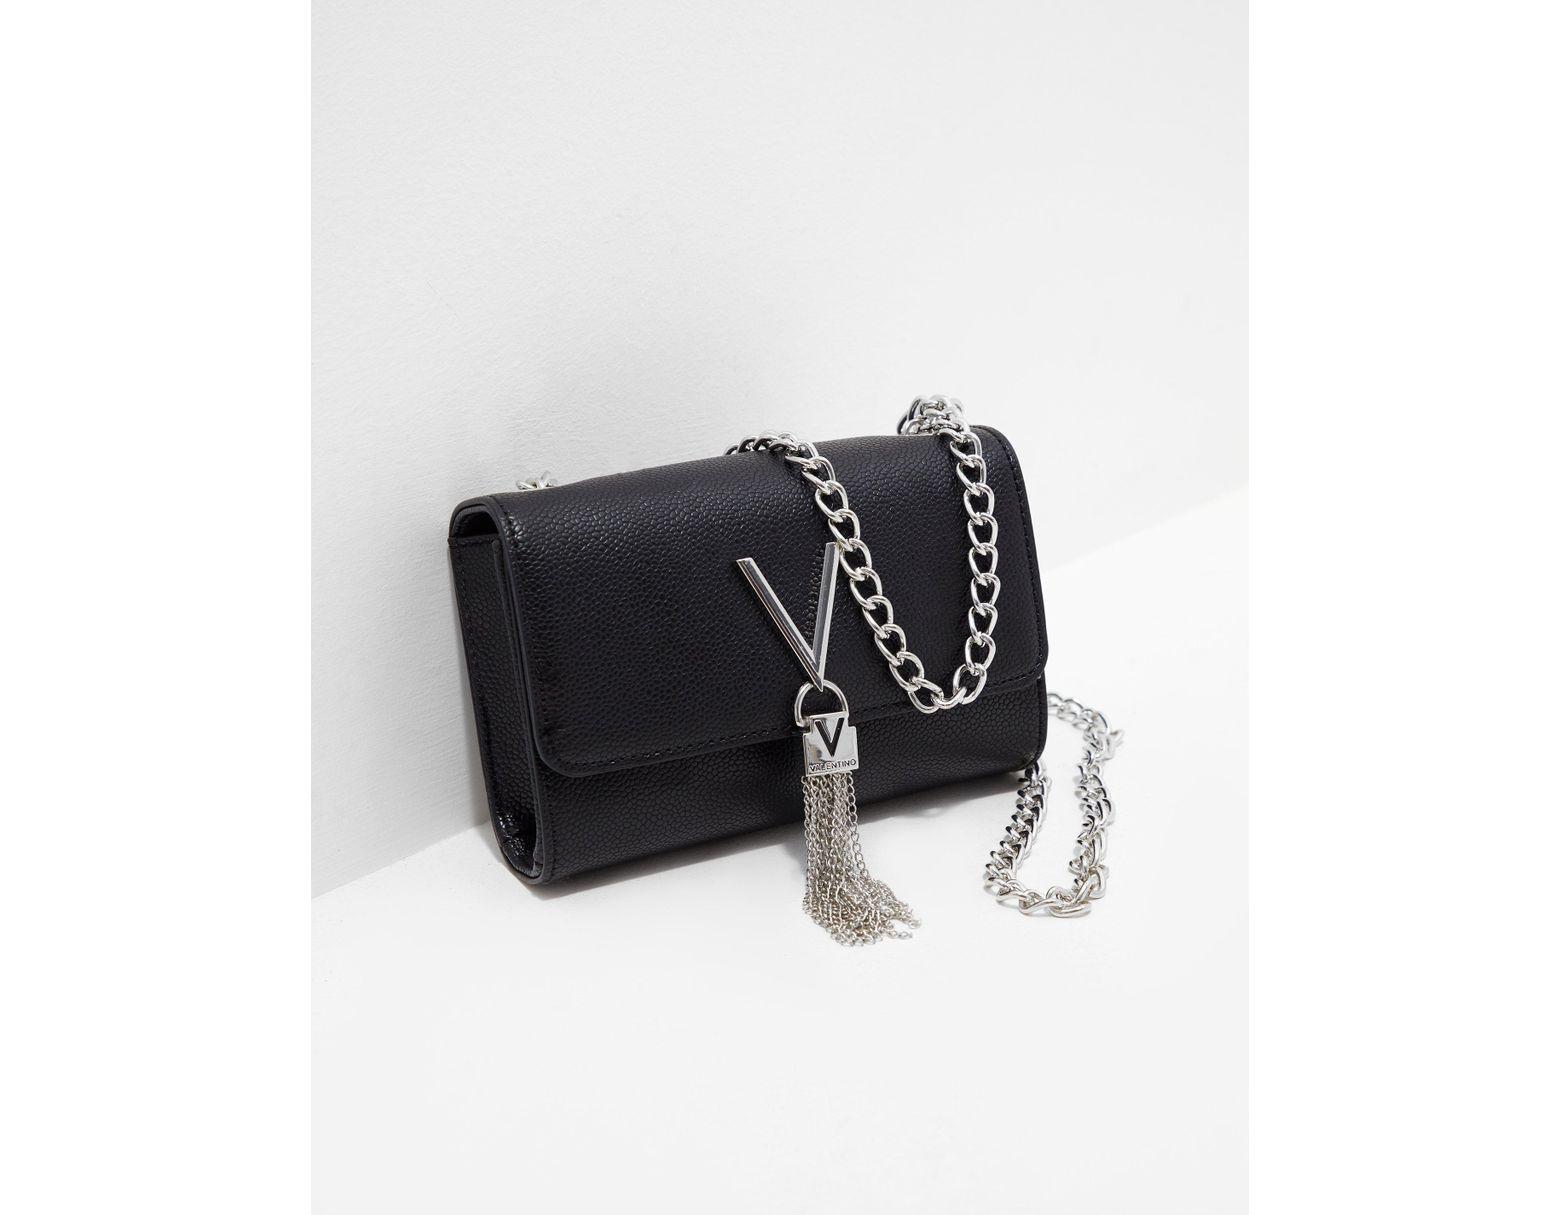 34eee19d8 Valentino By Mario Valentino Divina Chain Shoulder Bag Black in Black - Lyst